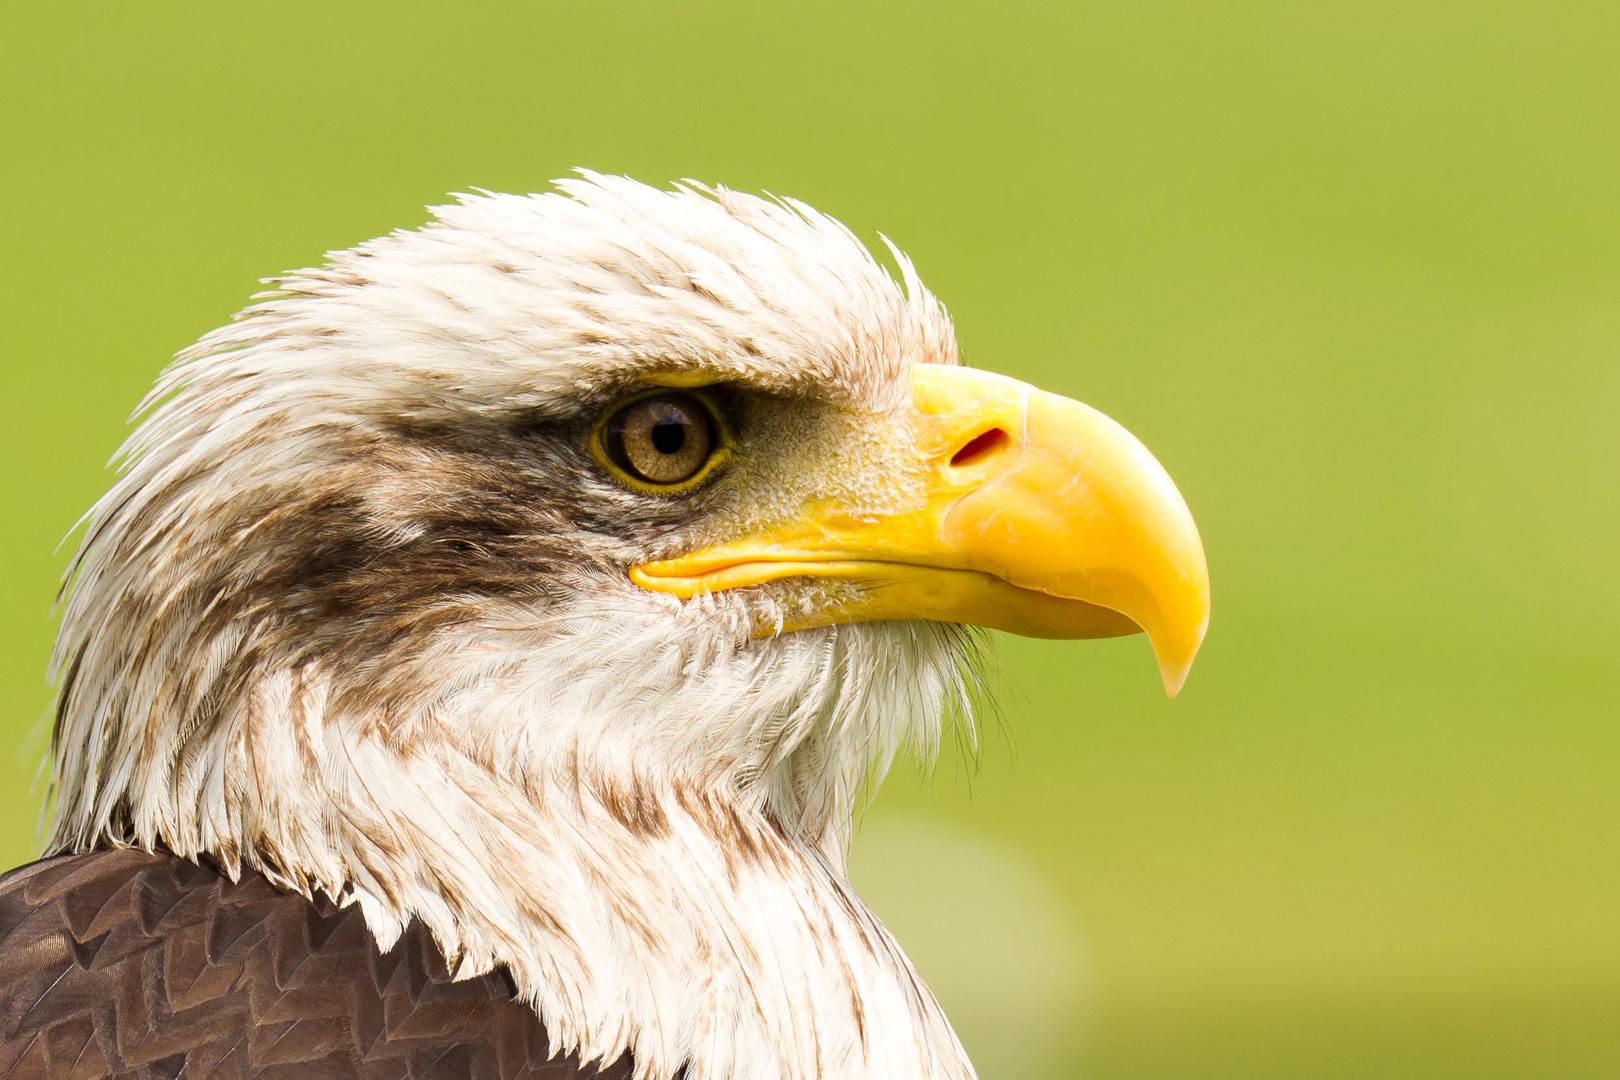 Das Adlerauge sieht alles